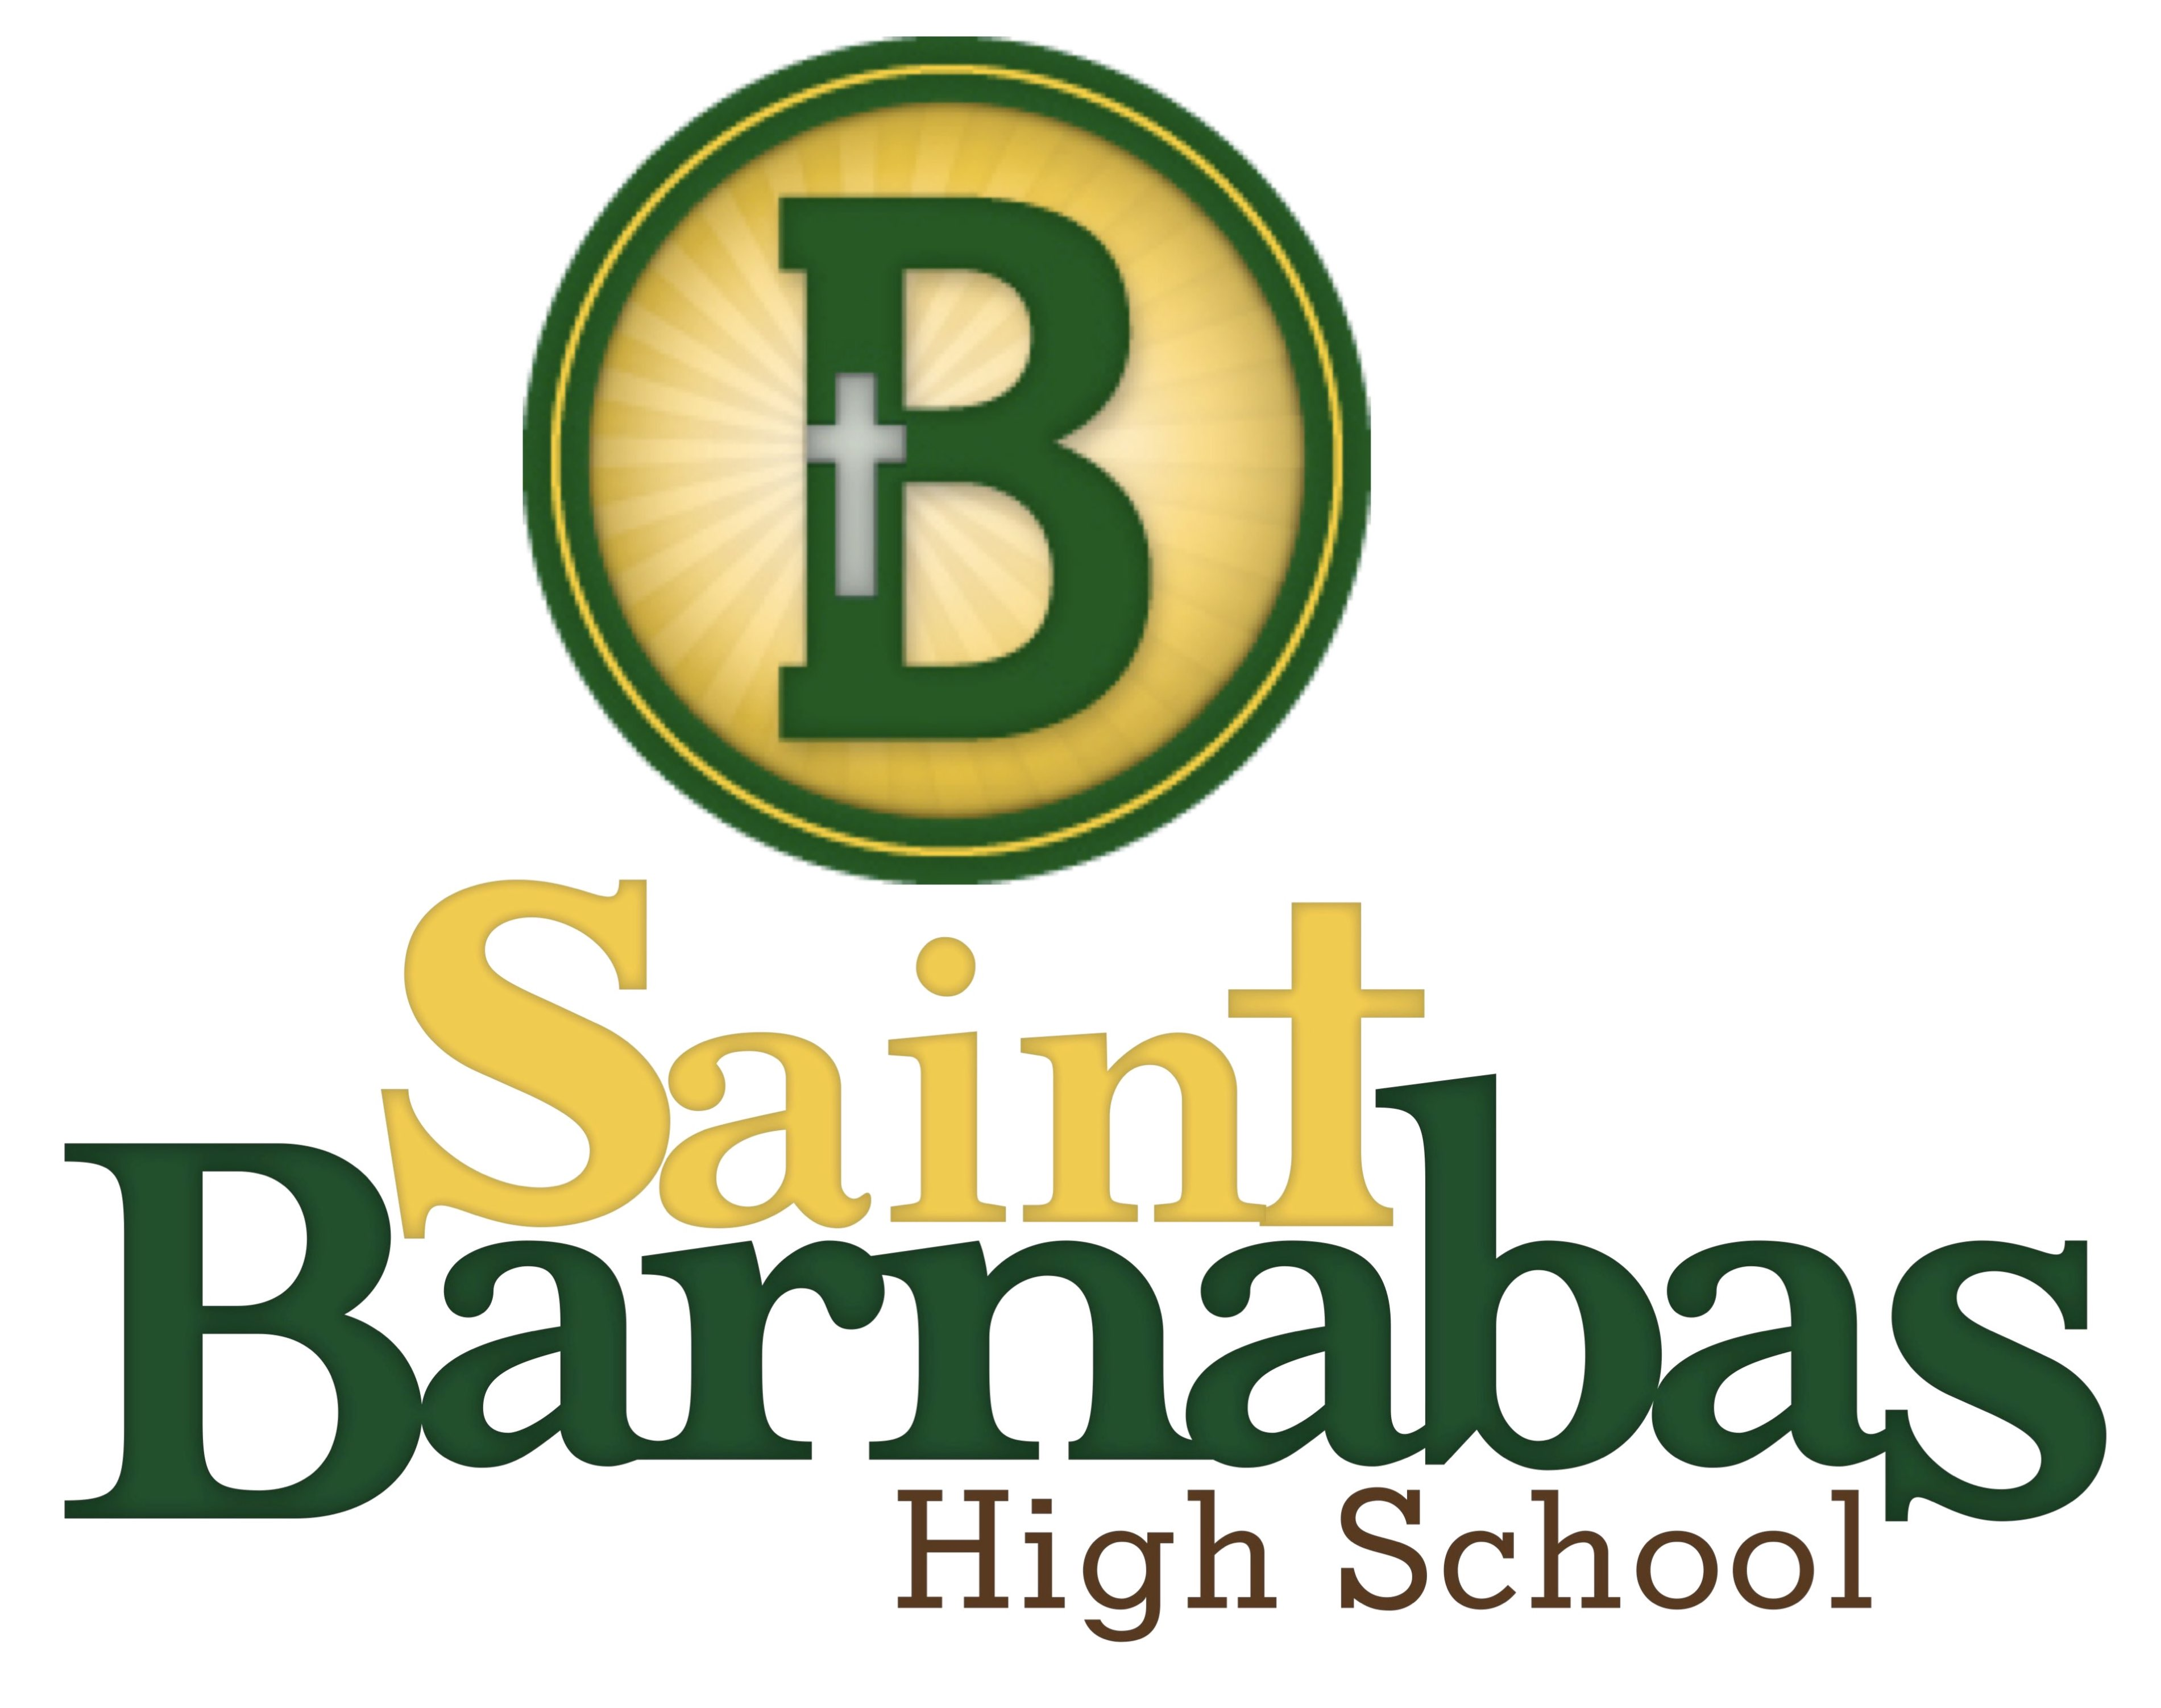 Saint Barnabas High School